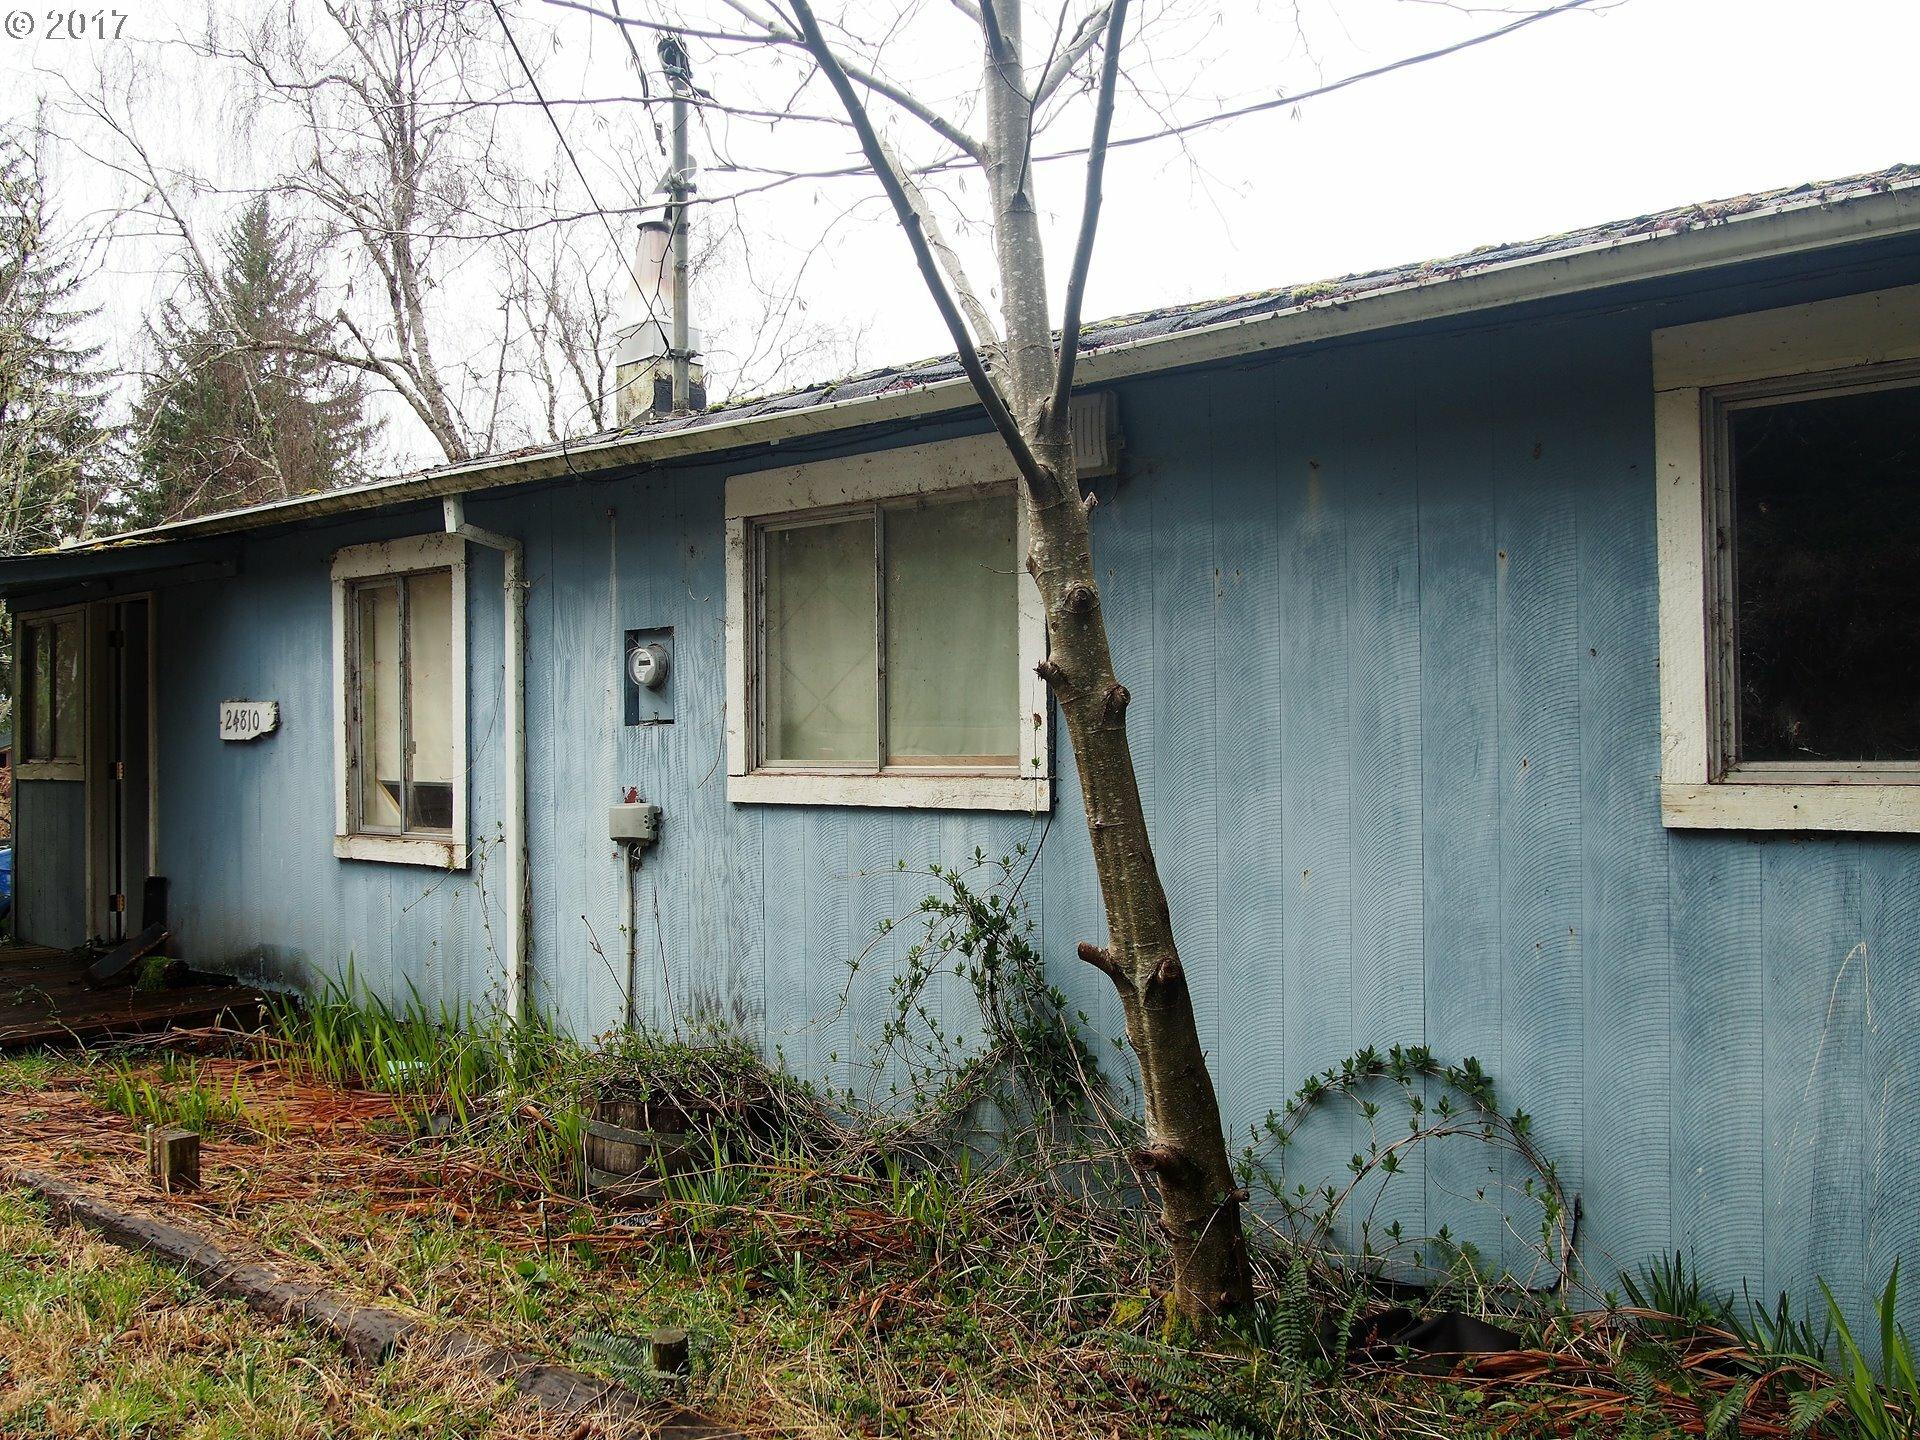 24800 Sandlake Rd, Cloverdale, OR - USA (photo 1)